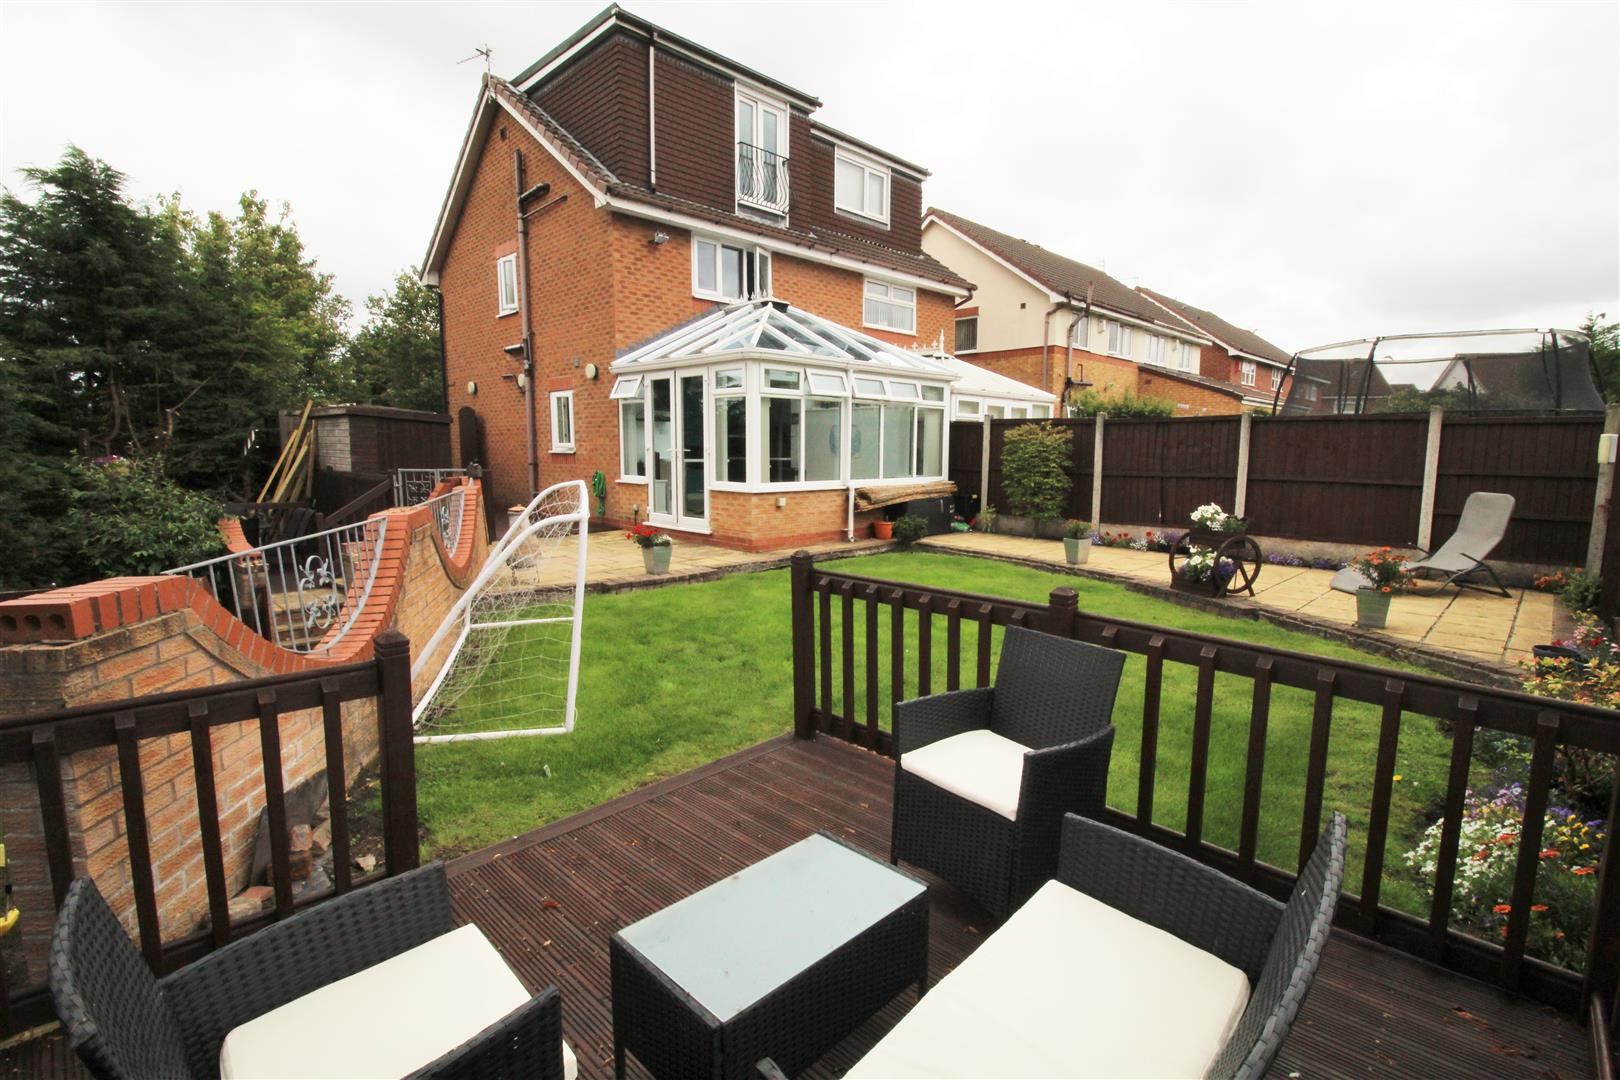 3 Bedrooms, House - Semi-Detached, Fistral Close, Liverpool